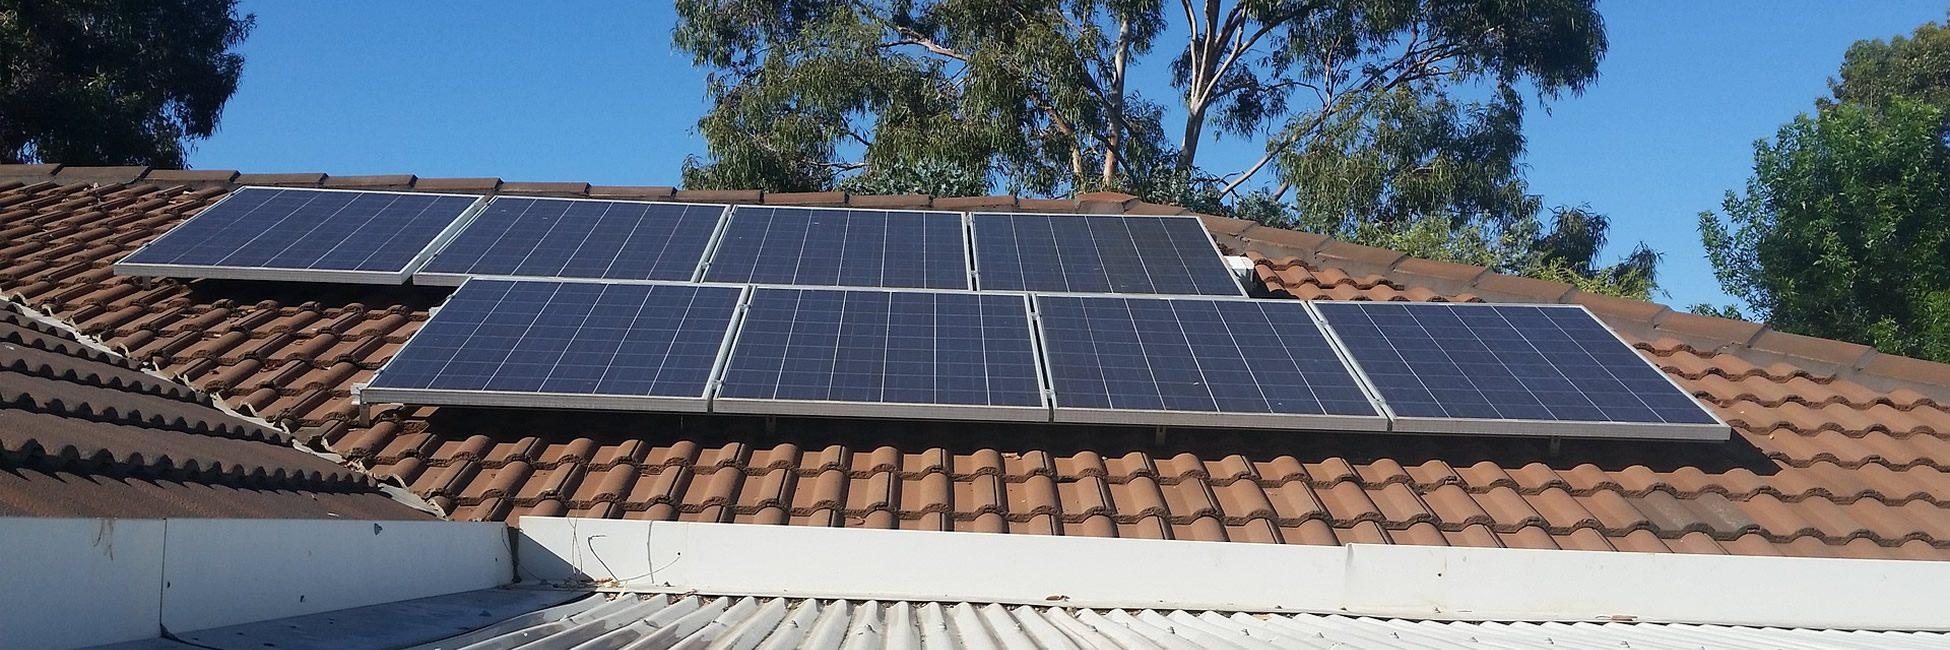 solar-panels-2685357_1920-1.jpg